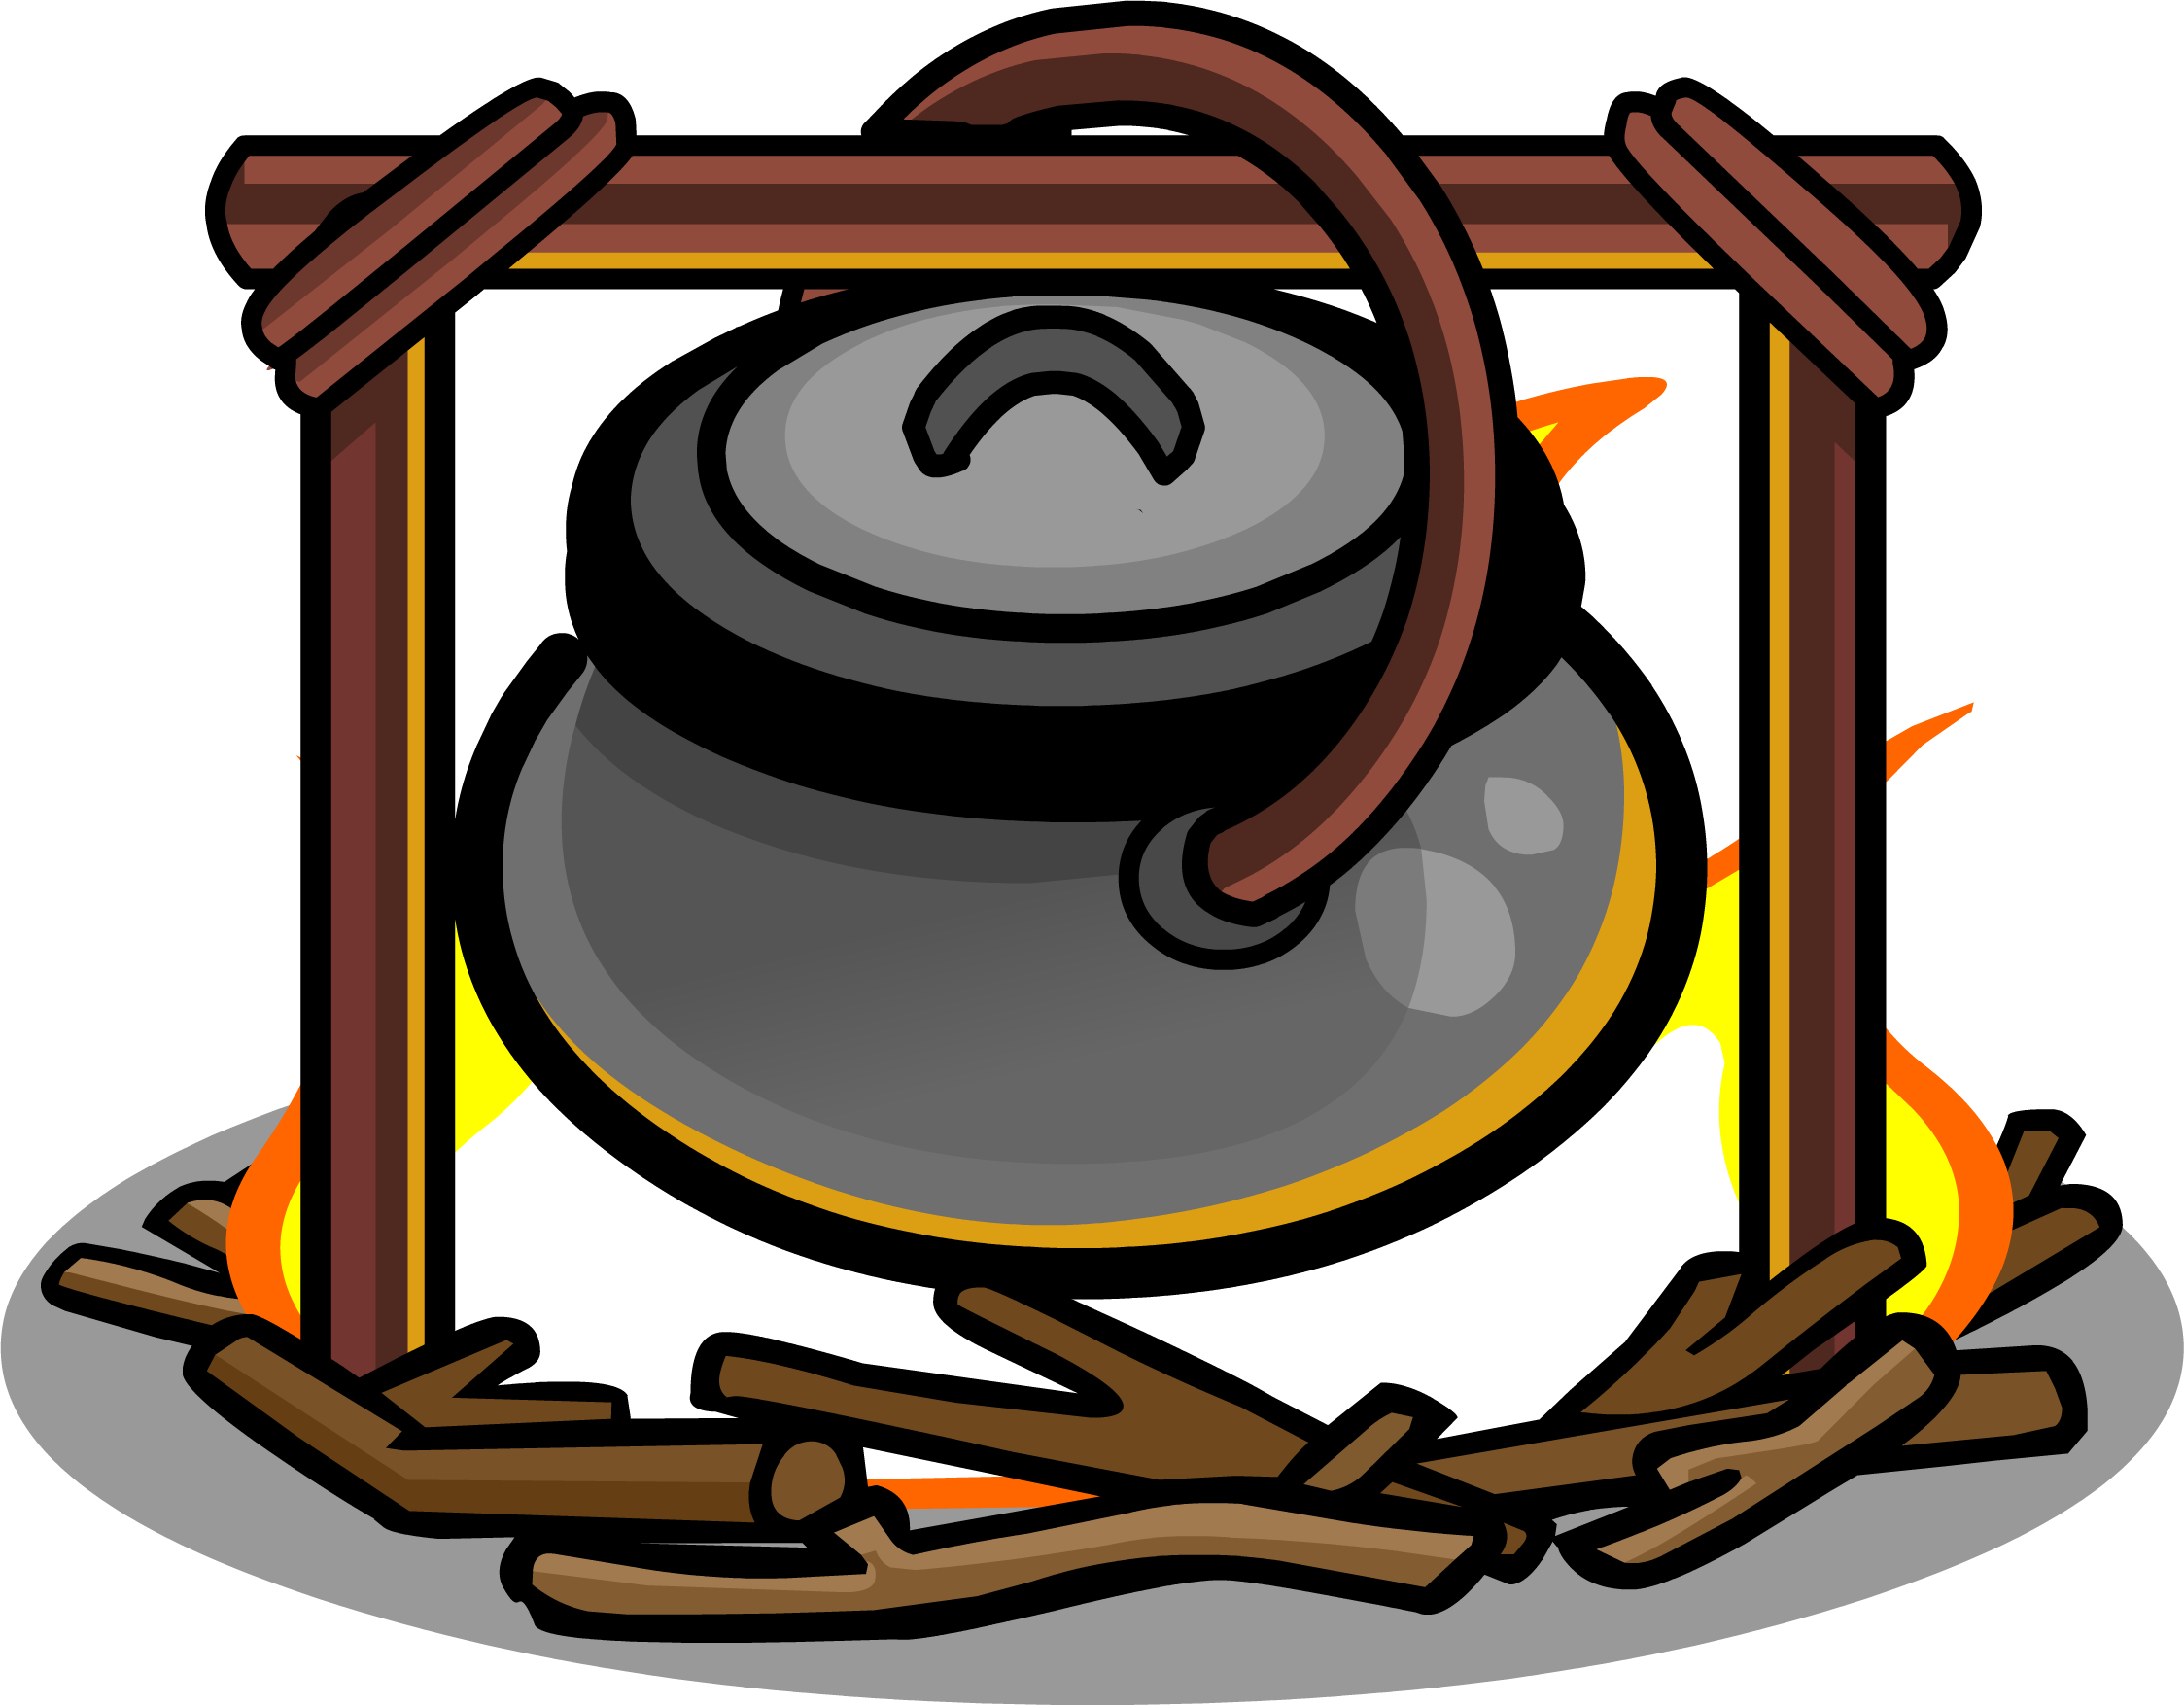 Boiling Cauldron